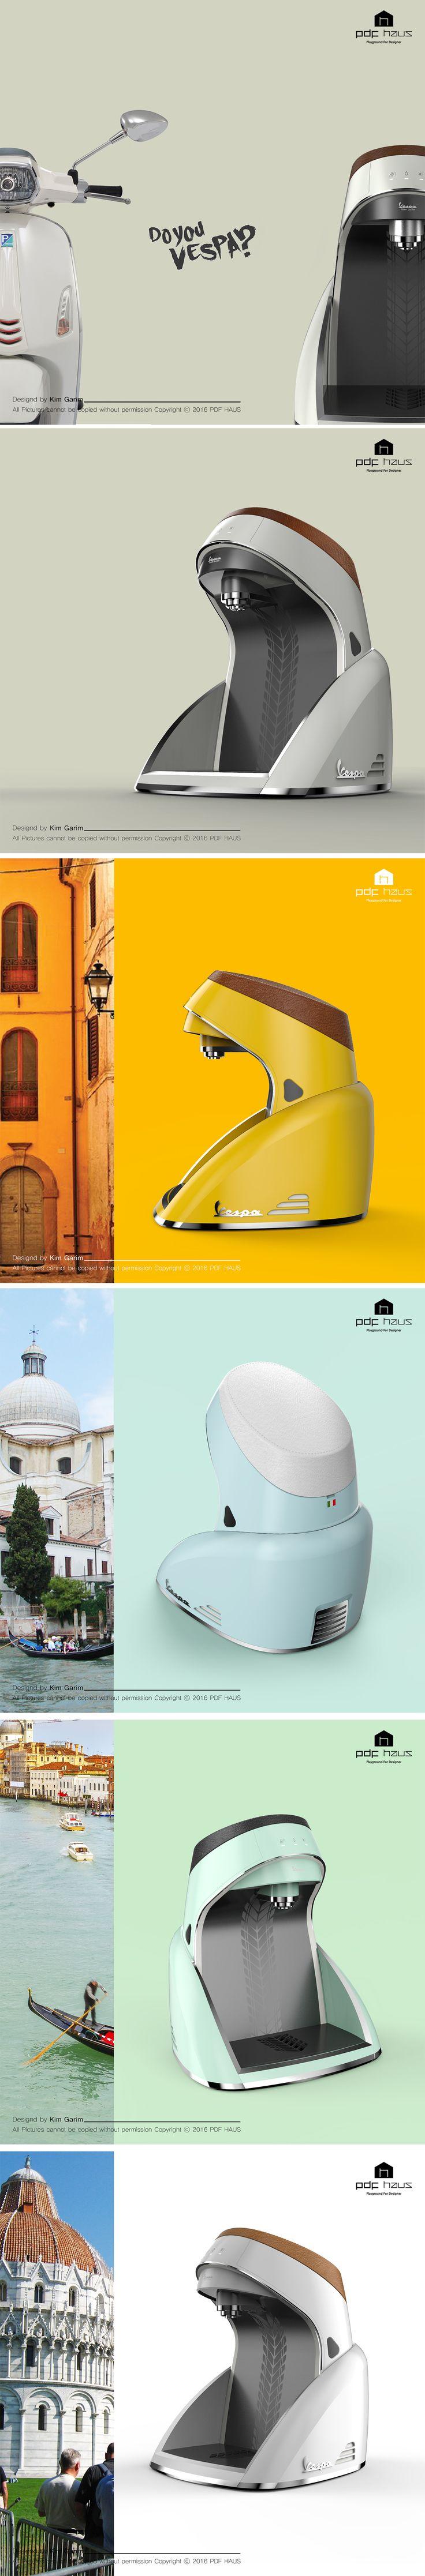 Vespa / water purifier / Product design / Industrial design / 제품디자인 / 산업디자인…